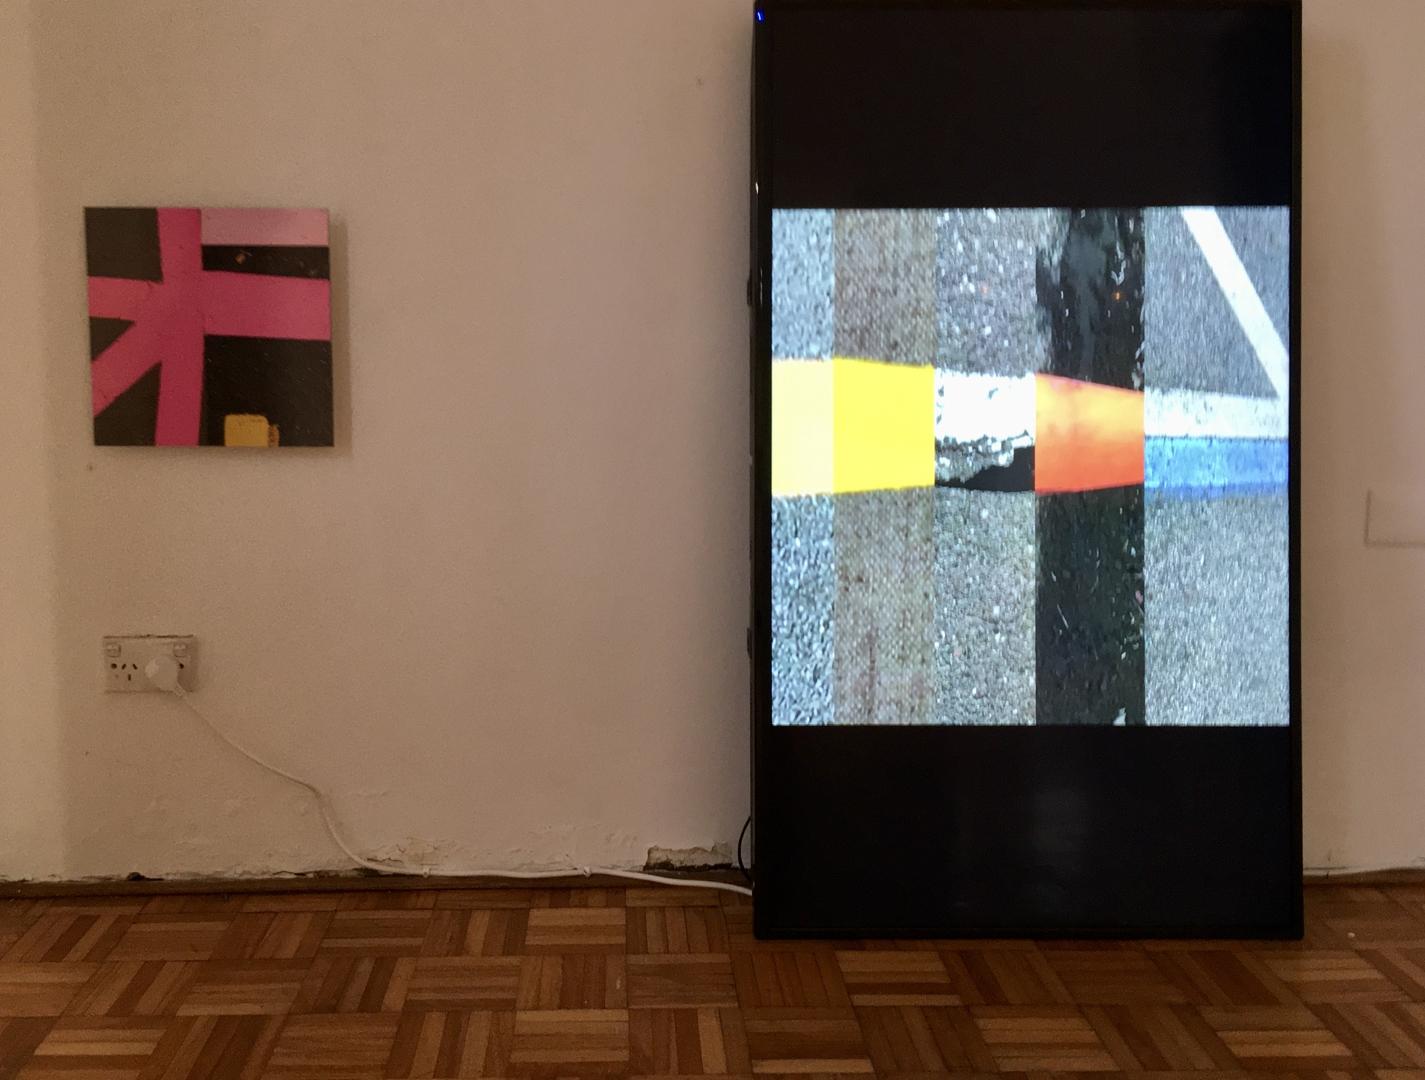 Roadworks by Michelle Le Dain & Pink/Shot image